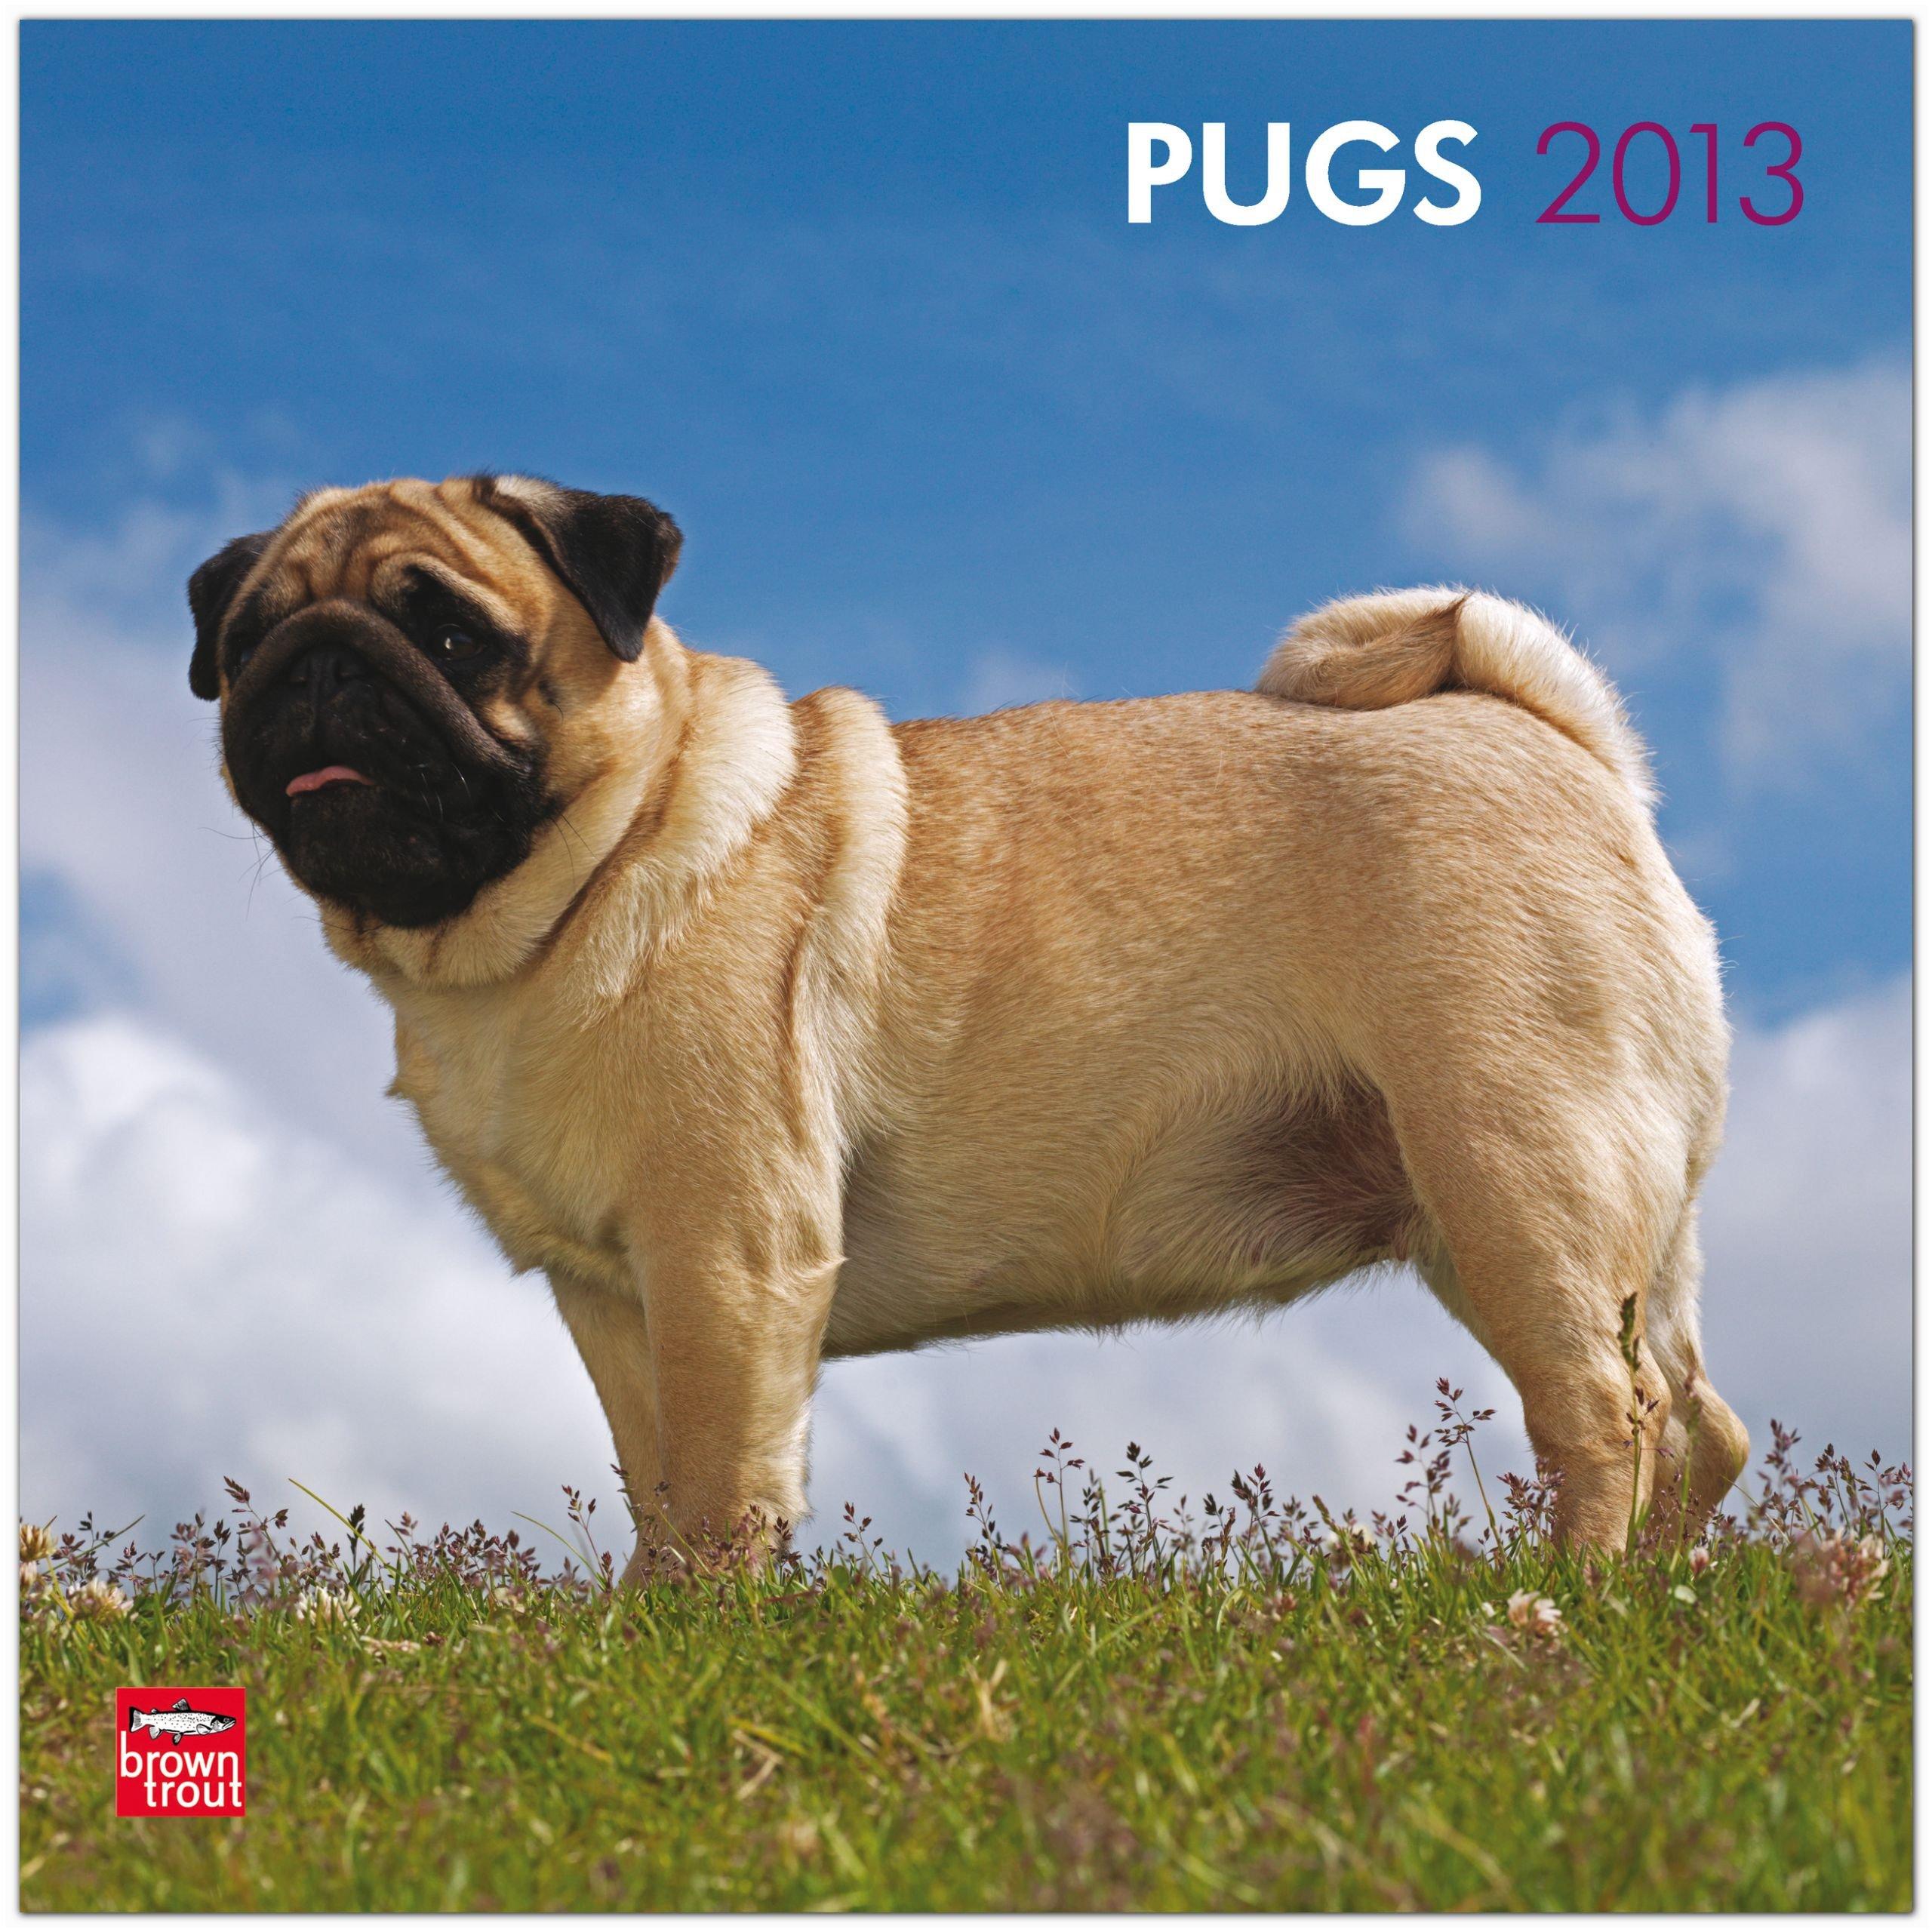 Pugs 2013 - Möpse - Original BrownTrout-Kalender